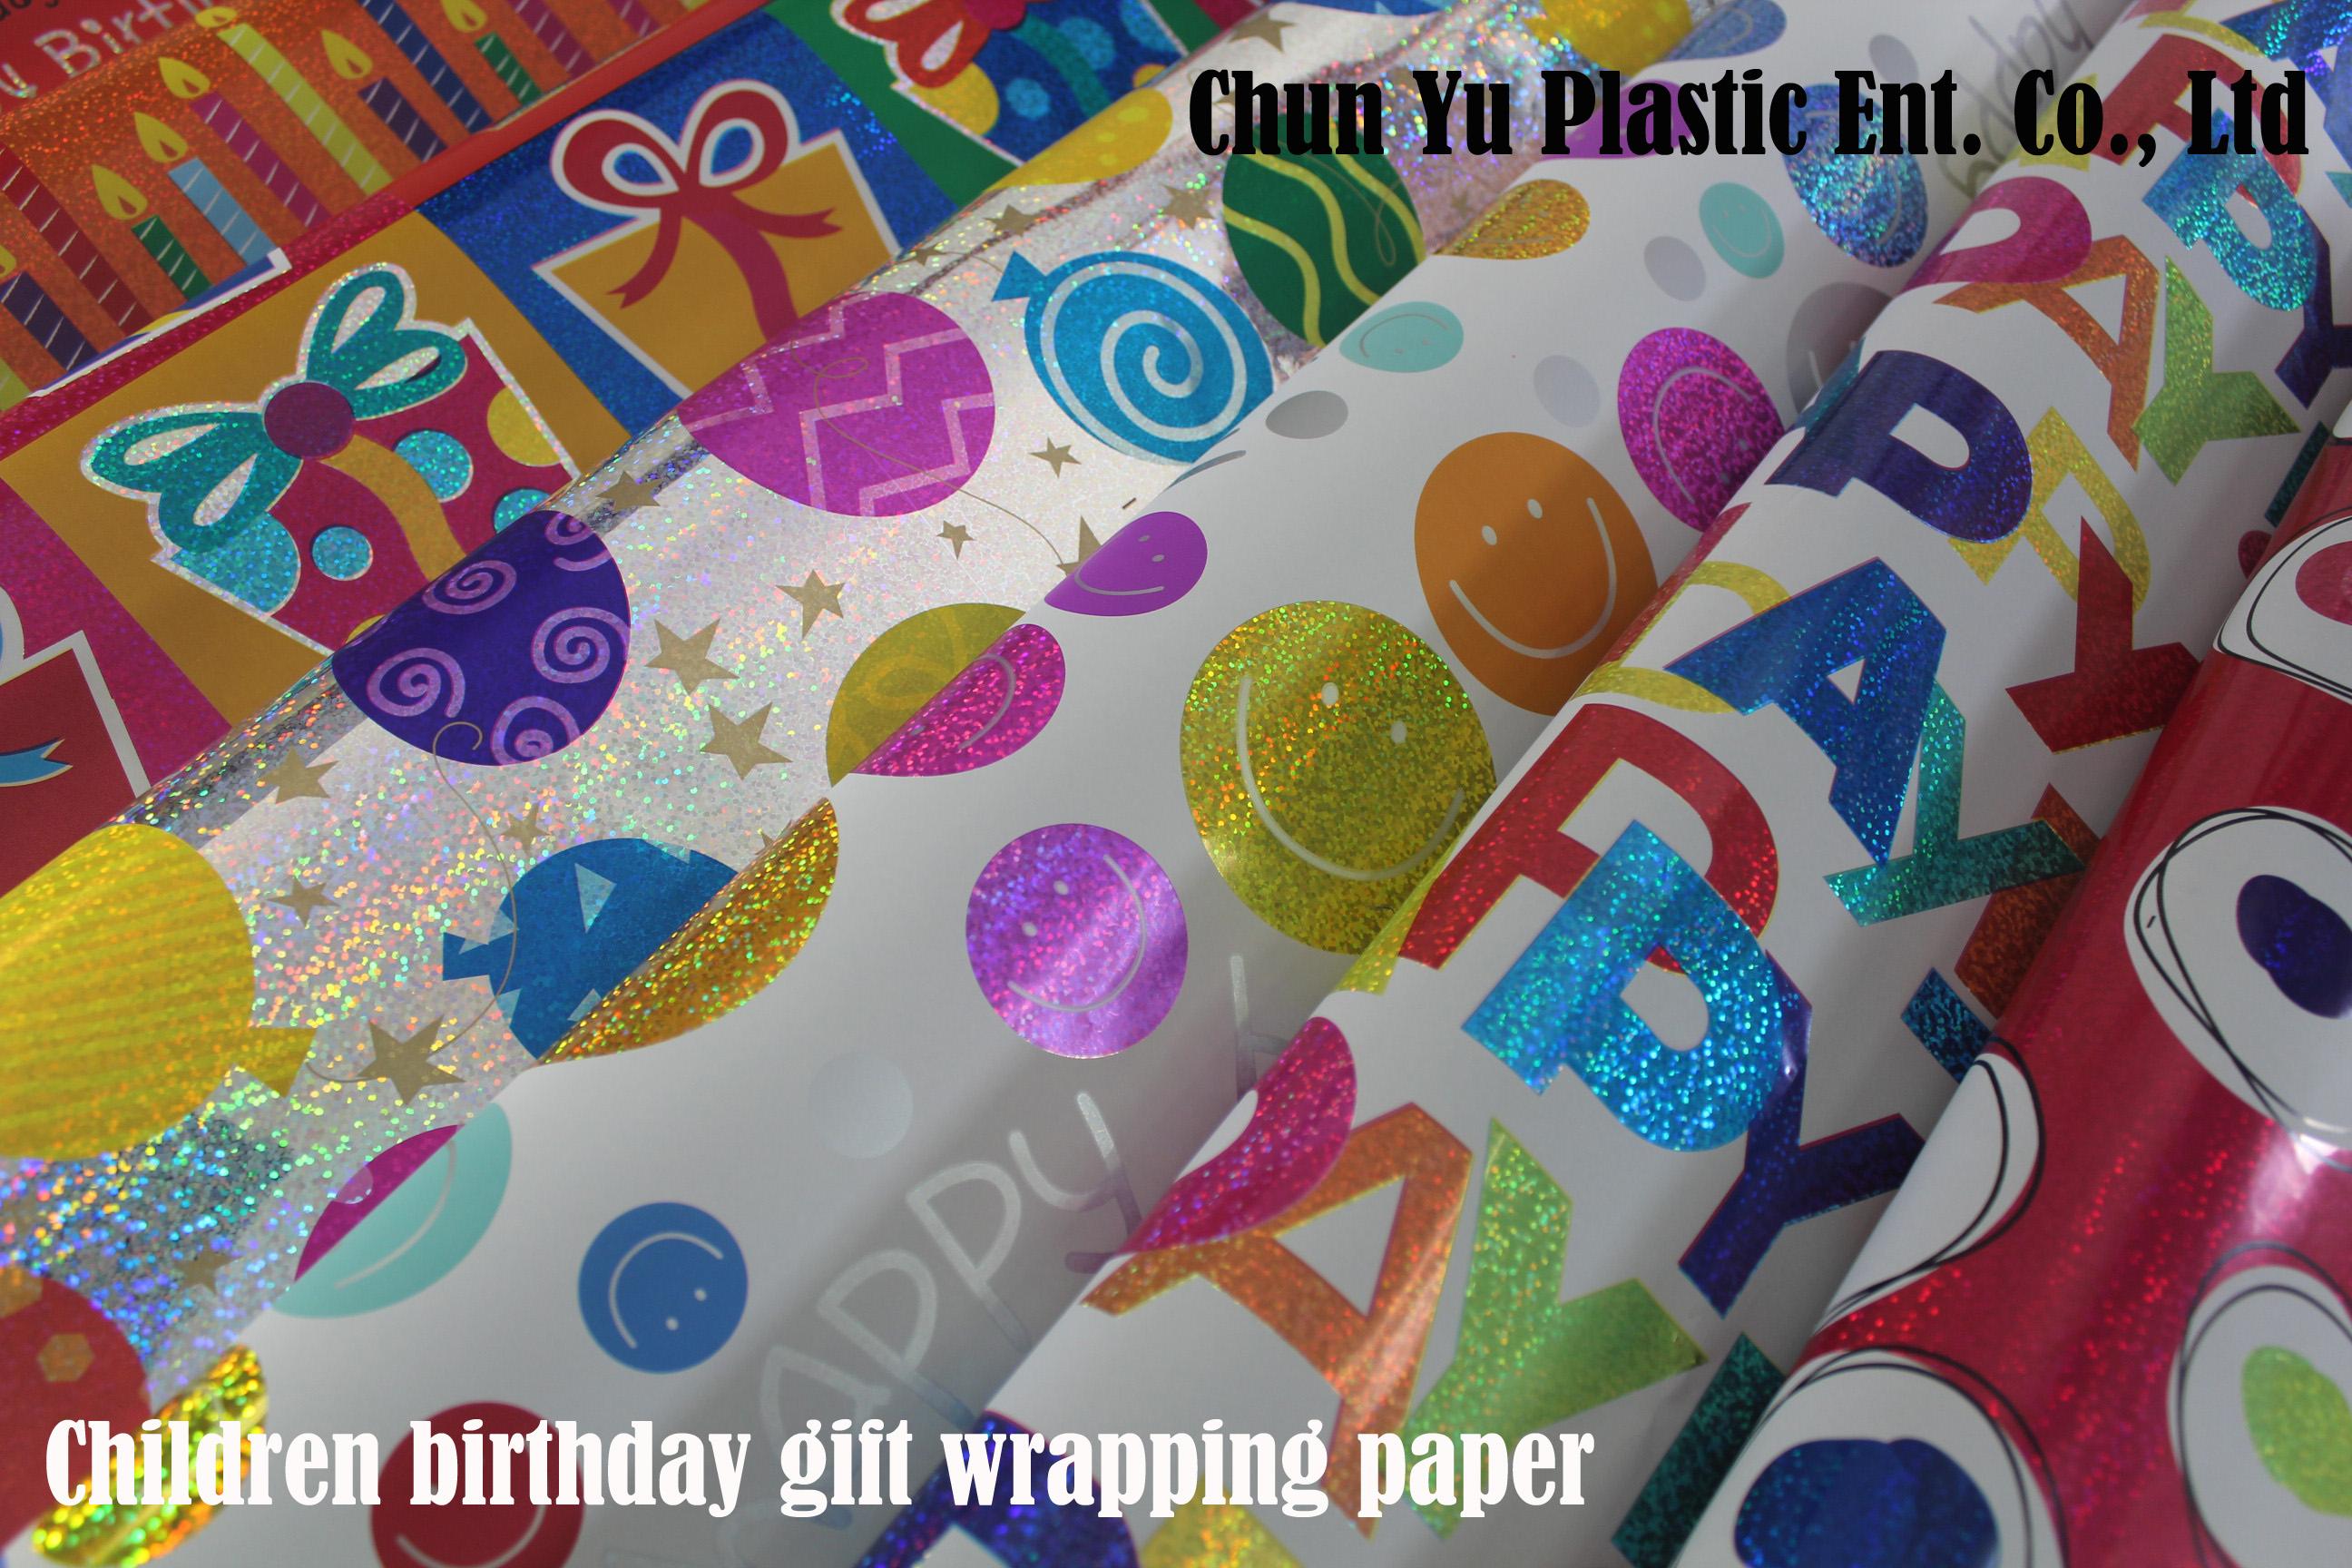 Chun Yu Plastic memproduksi kertas kado untuk kado anak dan pesta ulang tahun untuk anak perempuan dan laki-laki